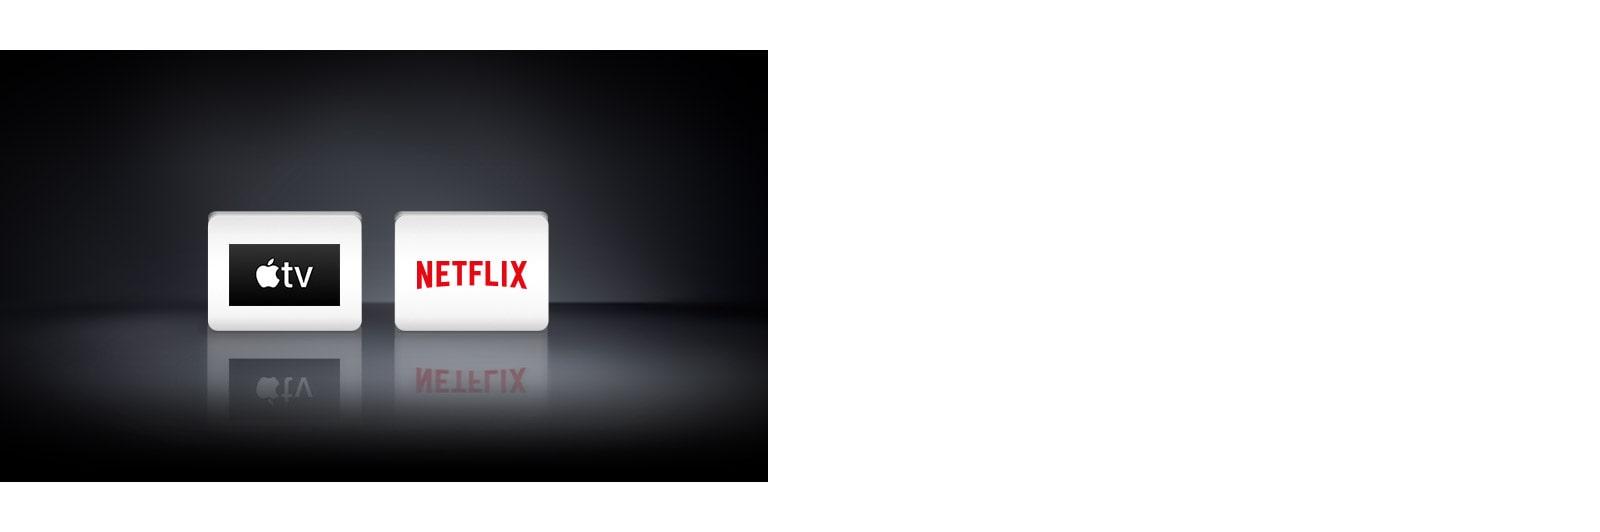 Dva logotipa: aplikacija Apple TV in Netflix